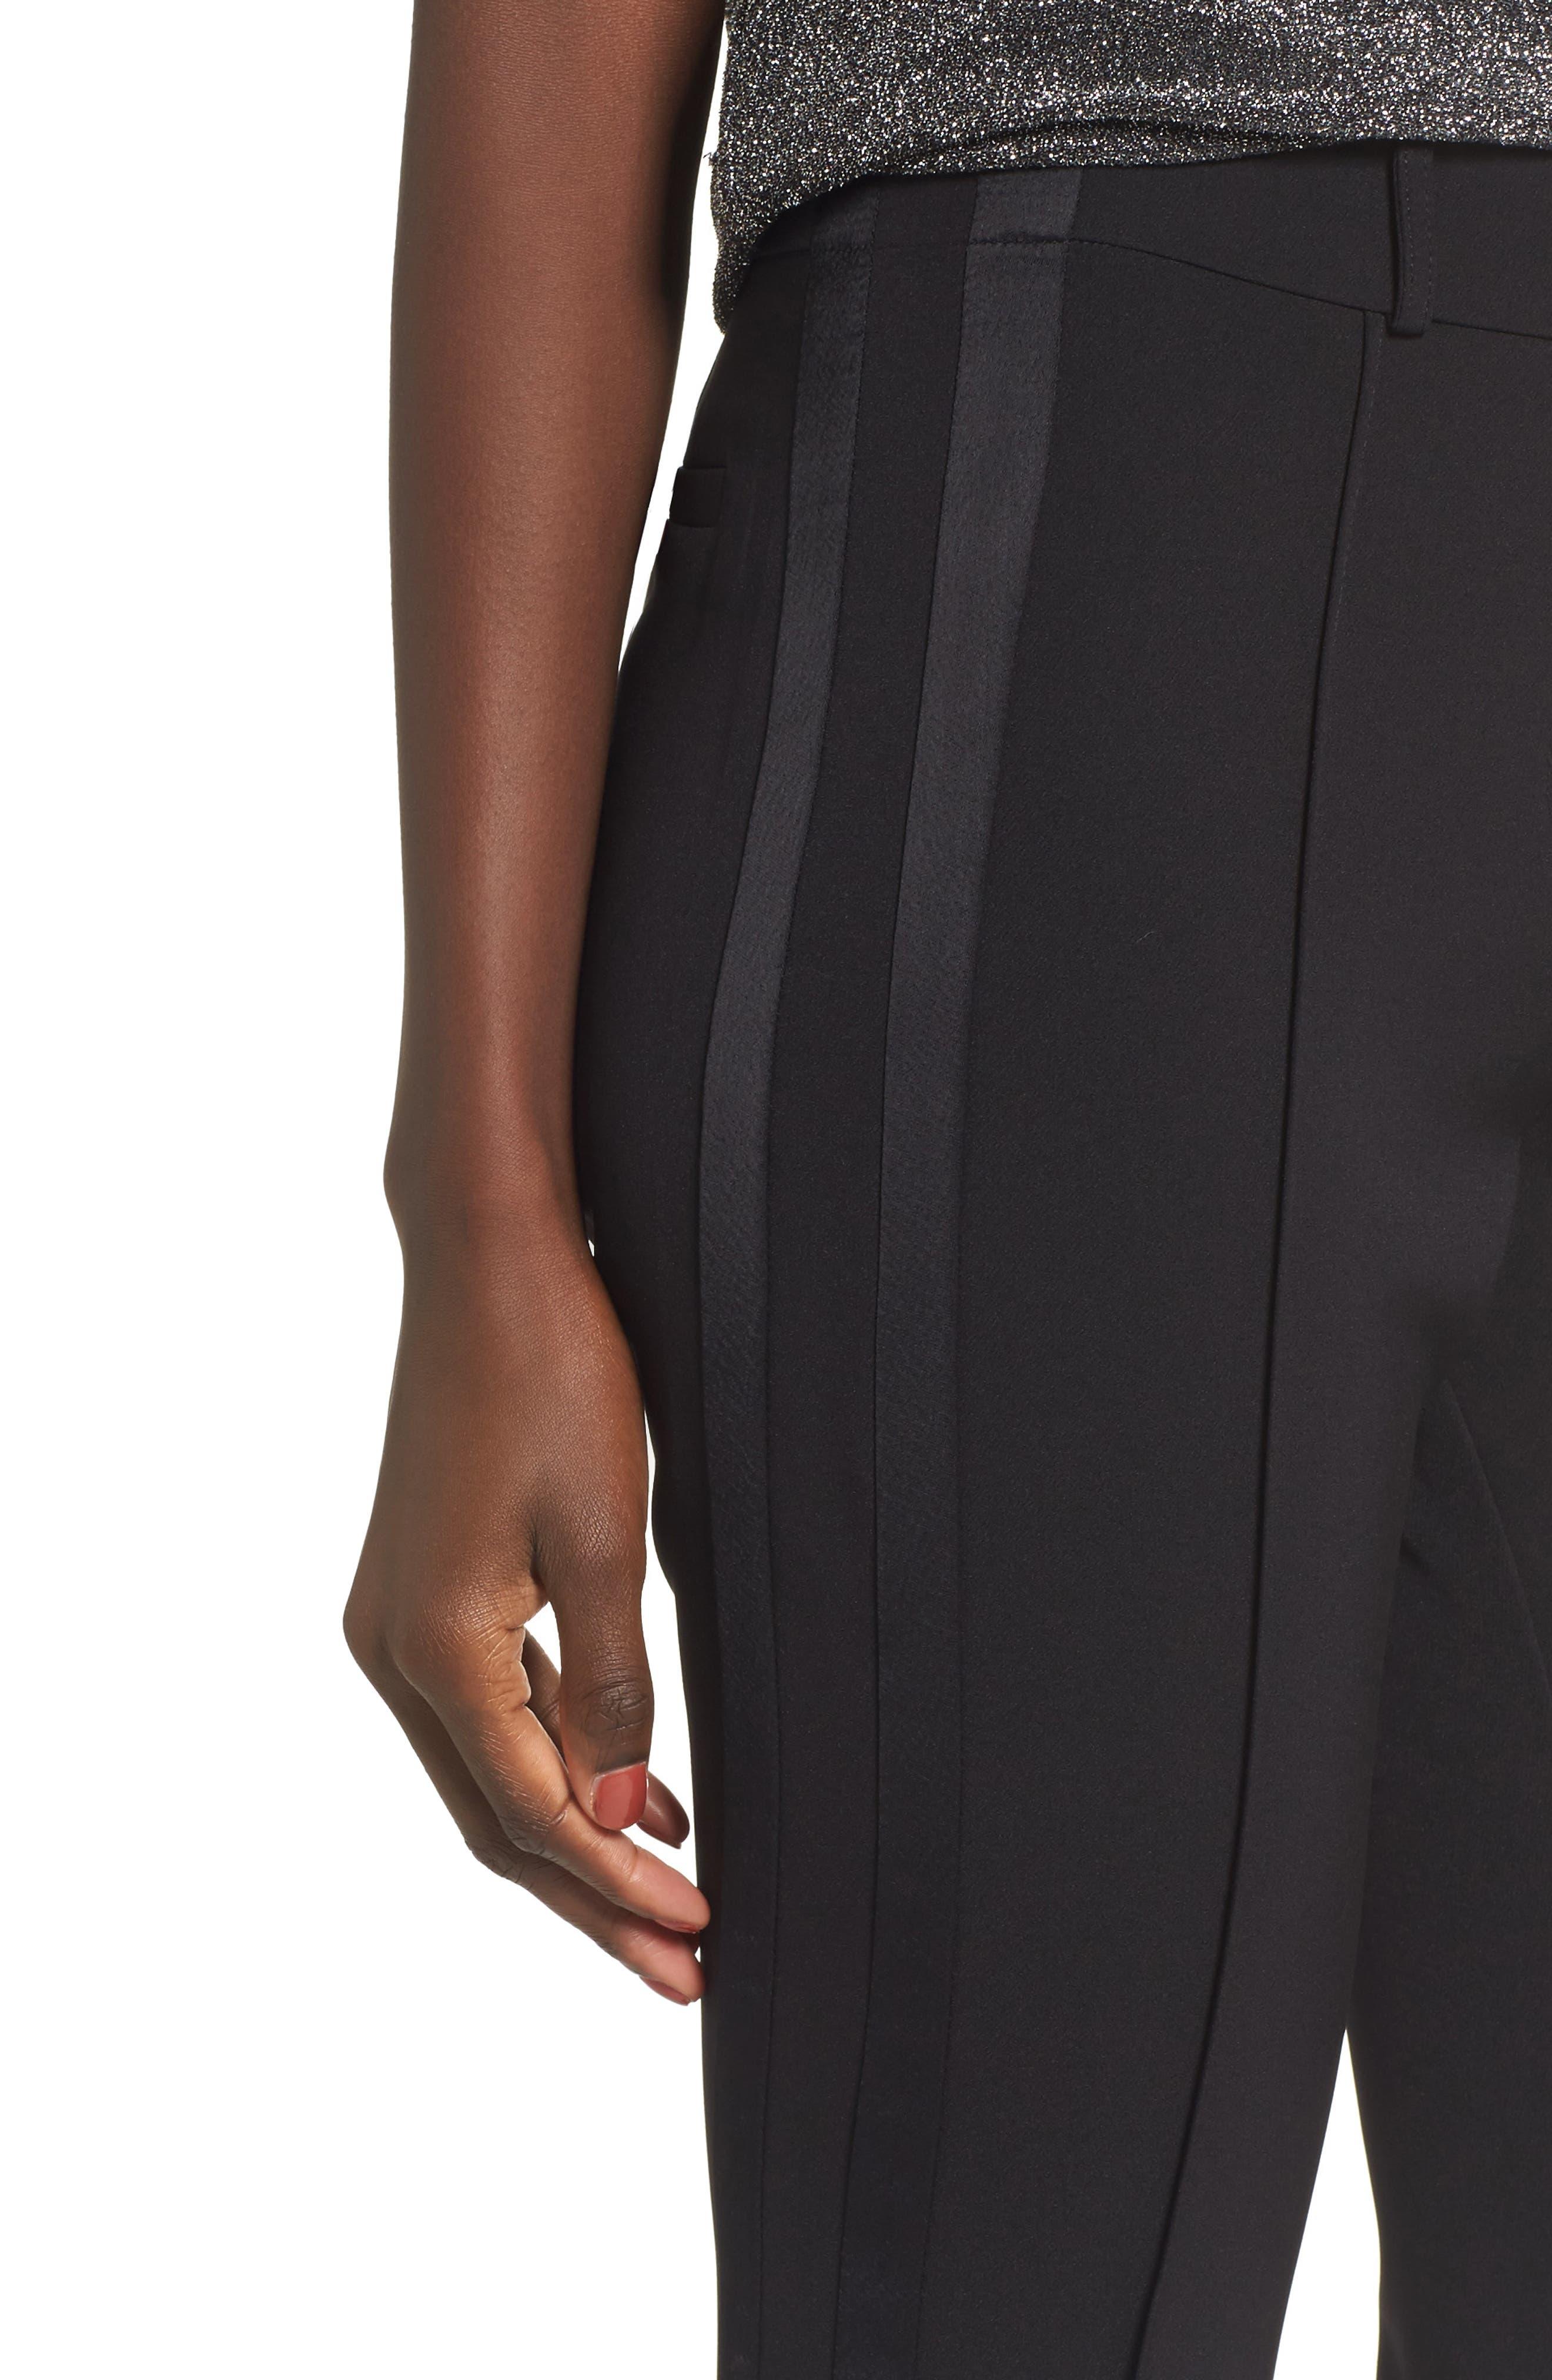 Roxy Flare Leg Pants,                             Alternate thumbnail 4, color,                             001